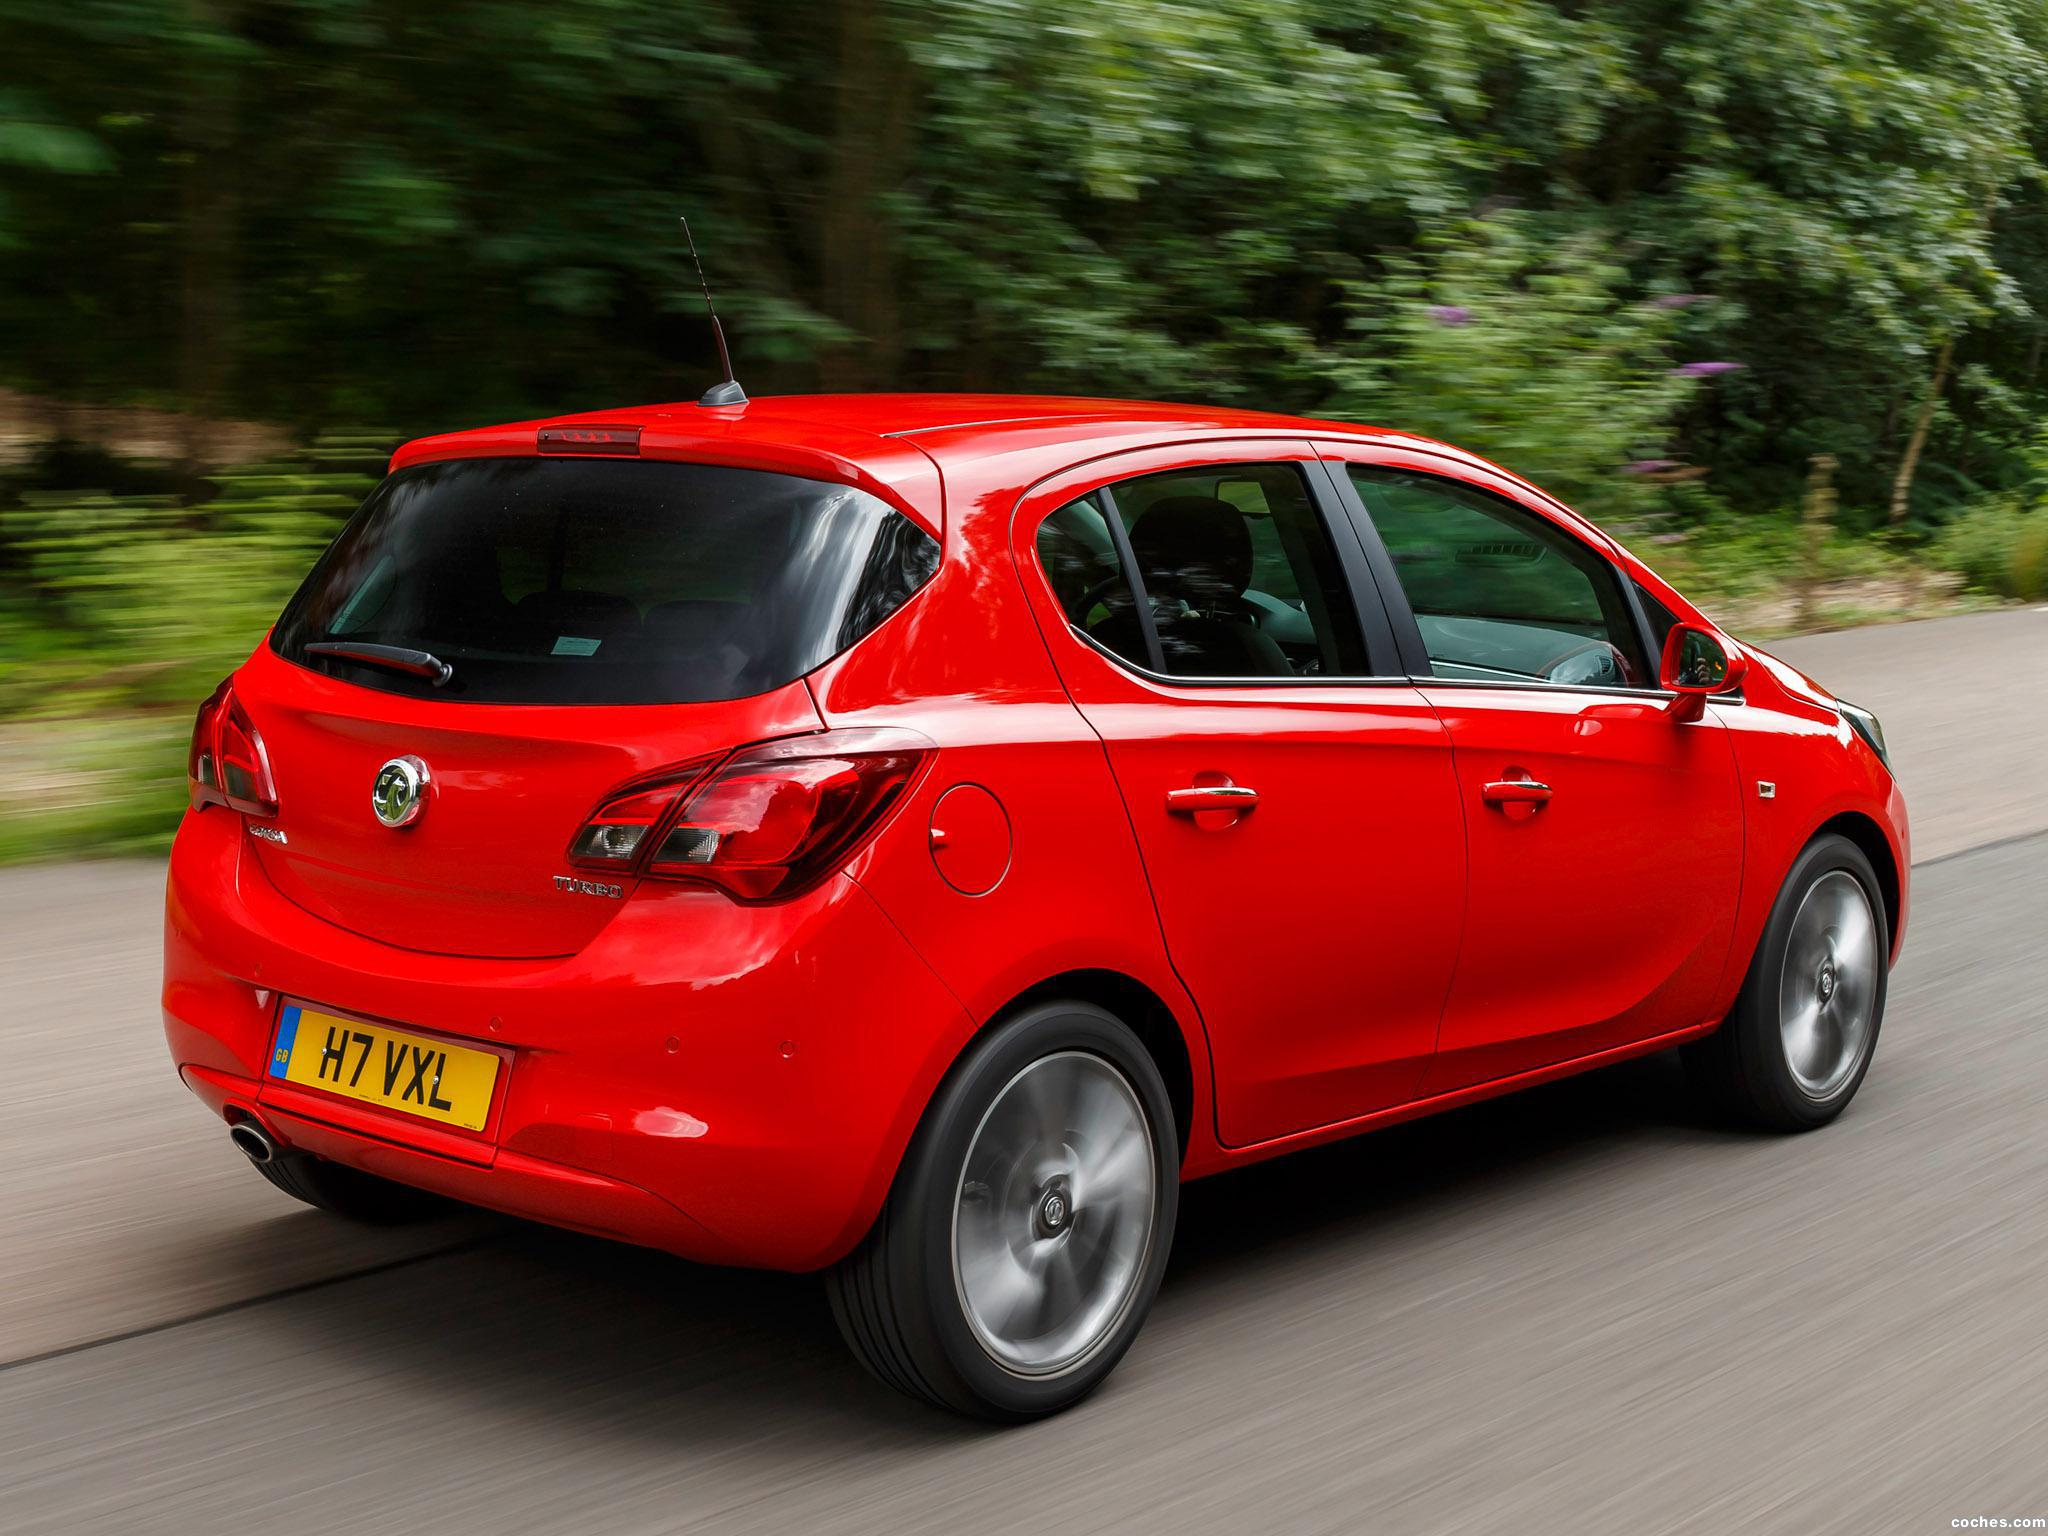 Foto 2 de Vauxhall Corsa 5 puertas 2014